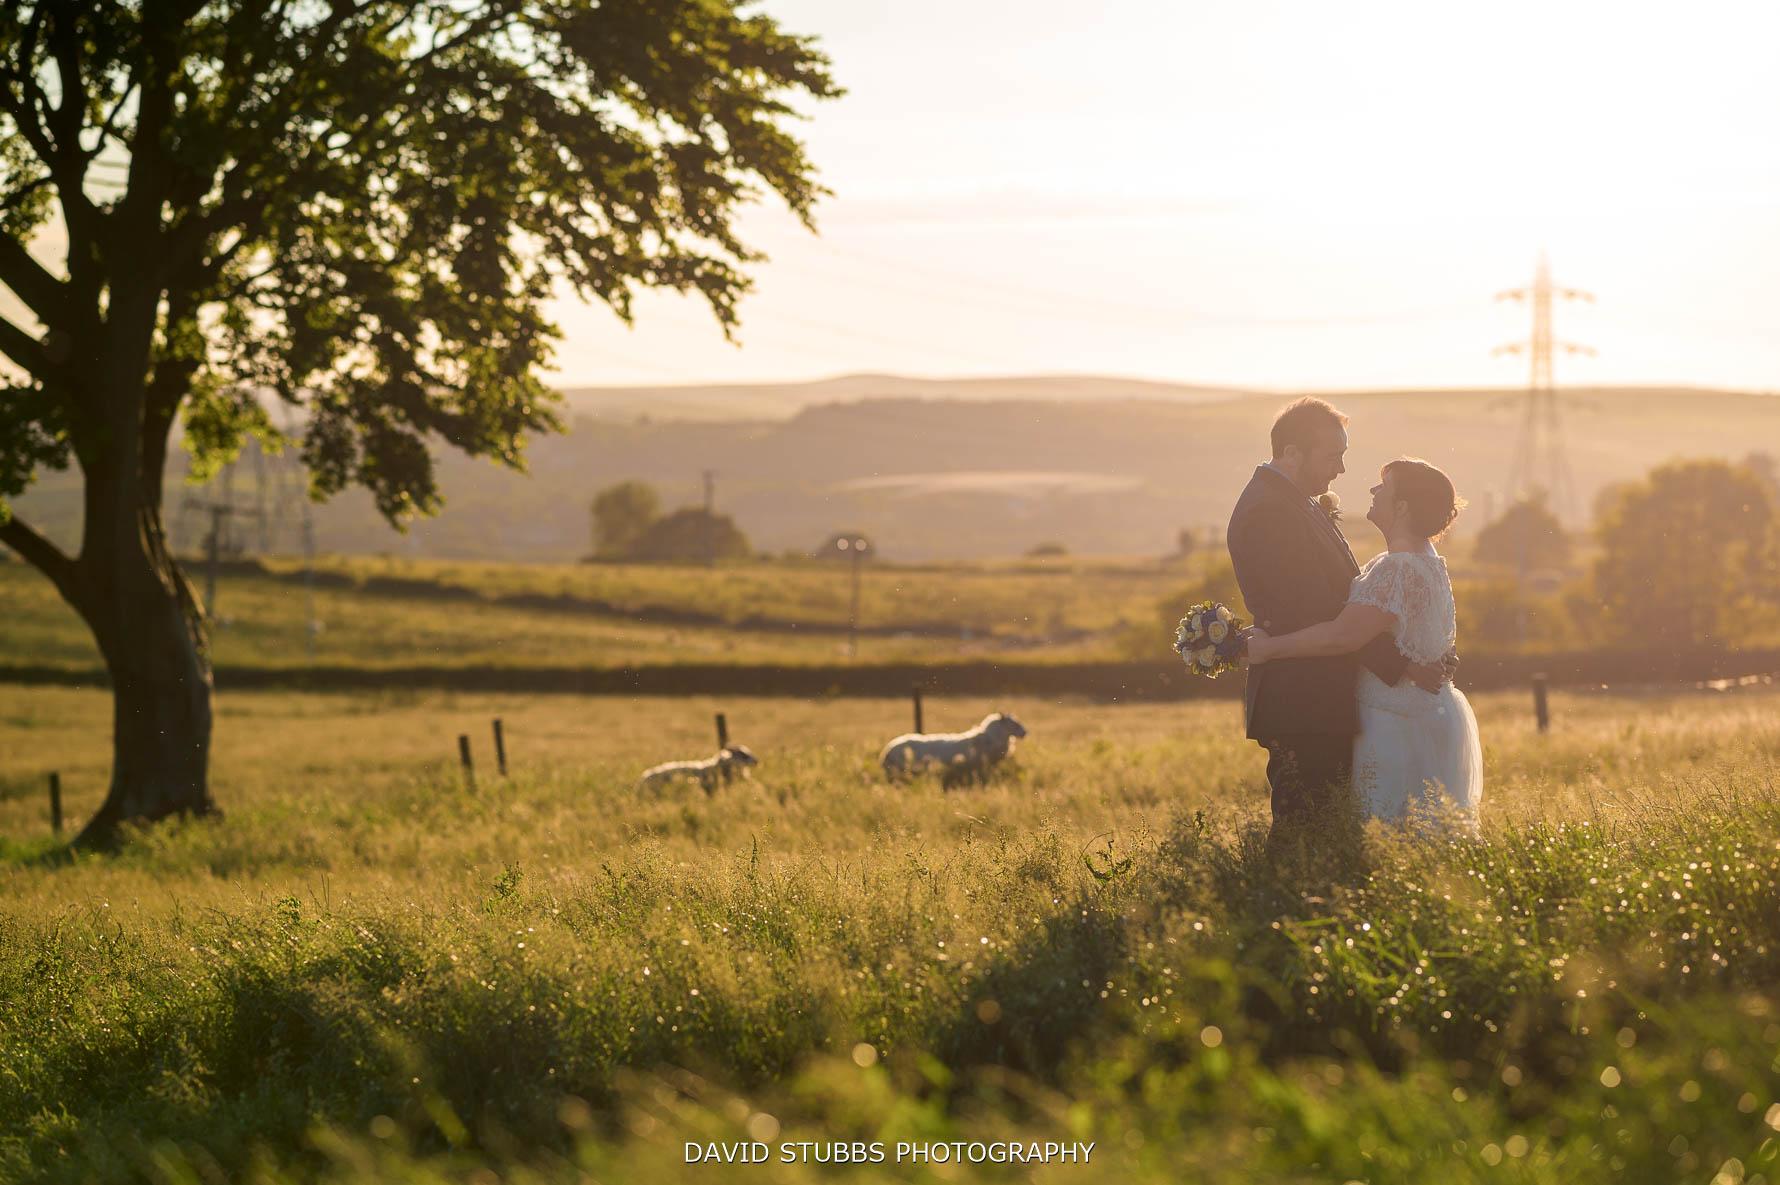 sunset at wellbeing farm wedding